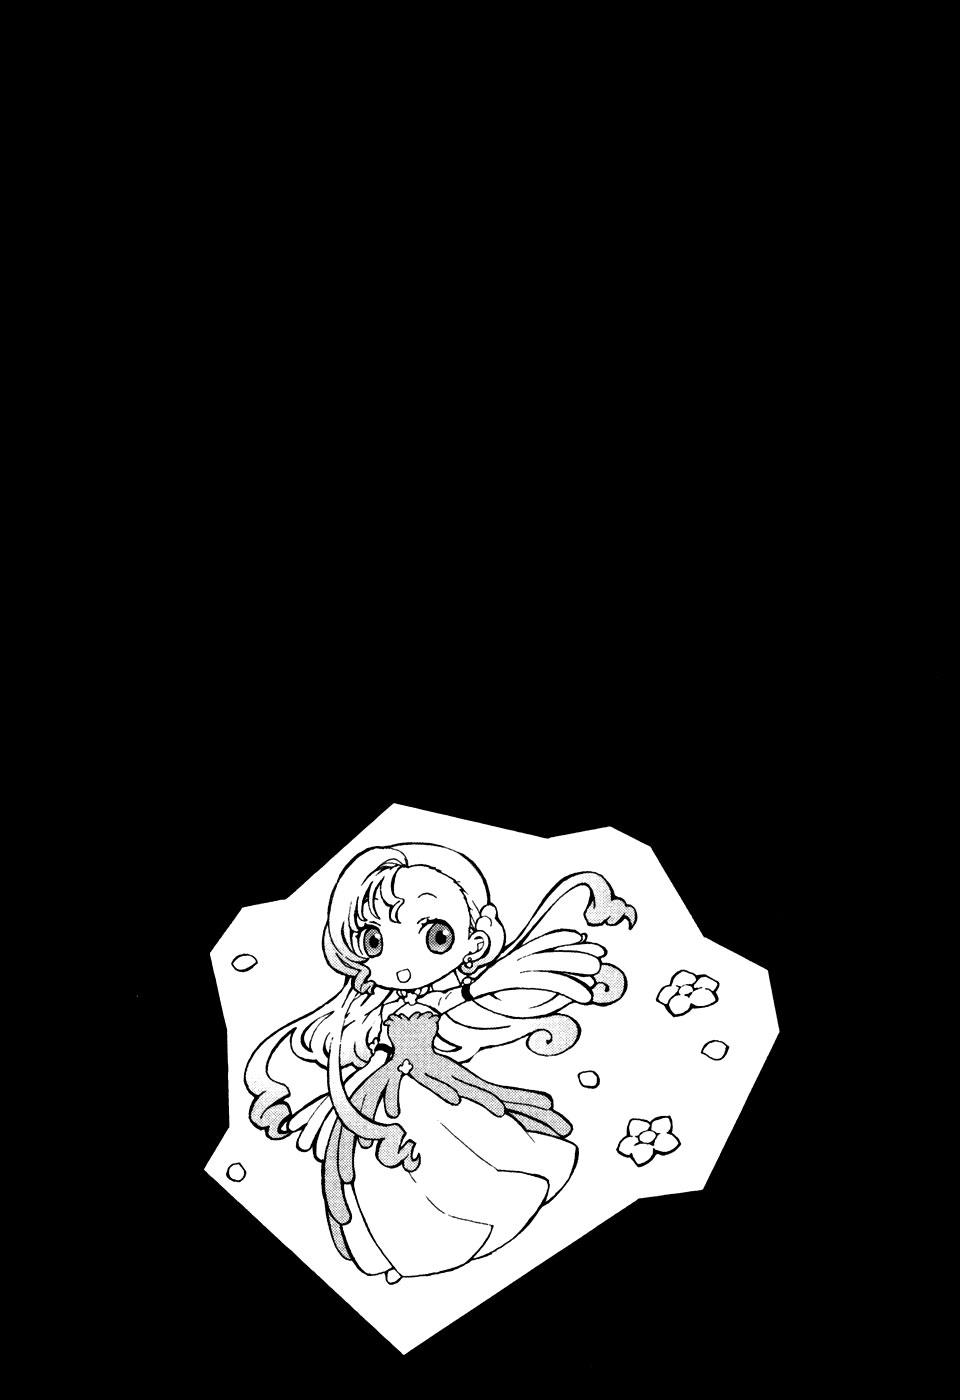 Code Geass: Lelouch Of The Rebellion Chap 017